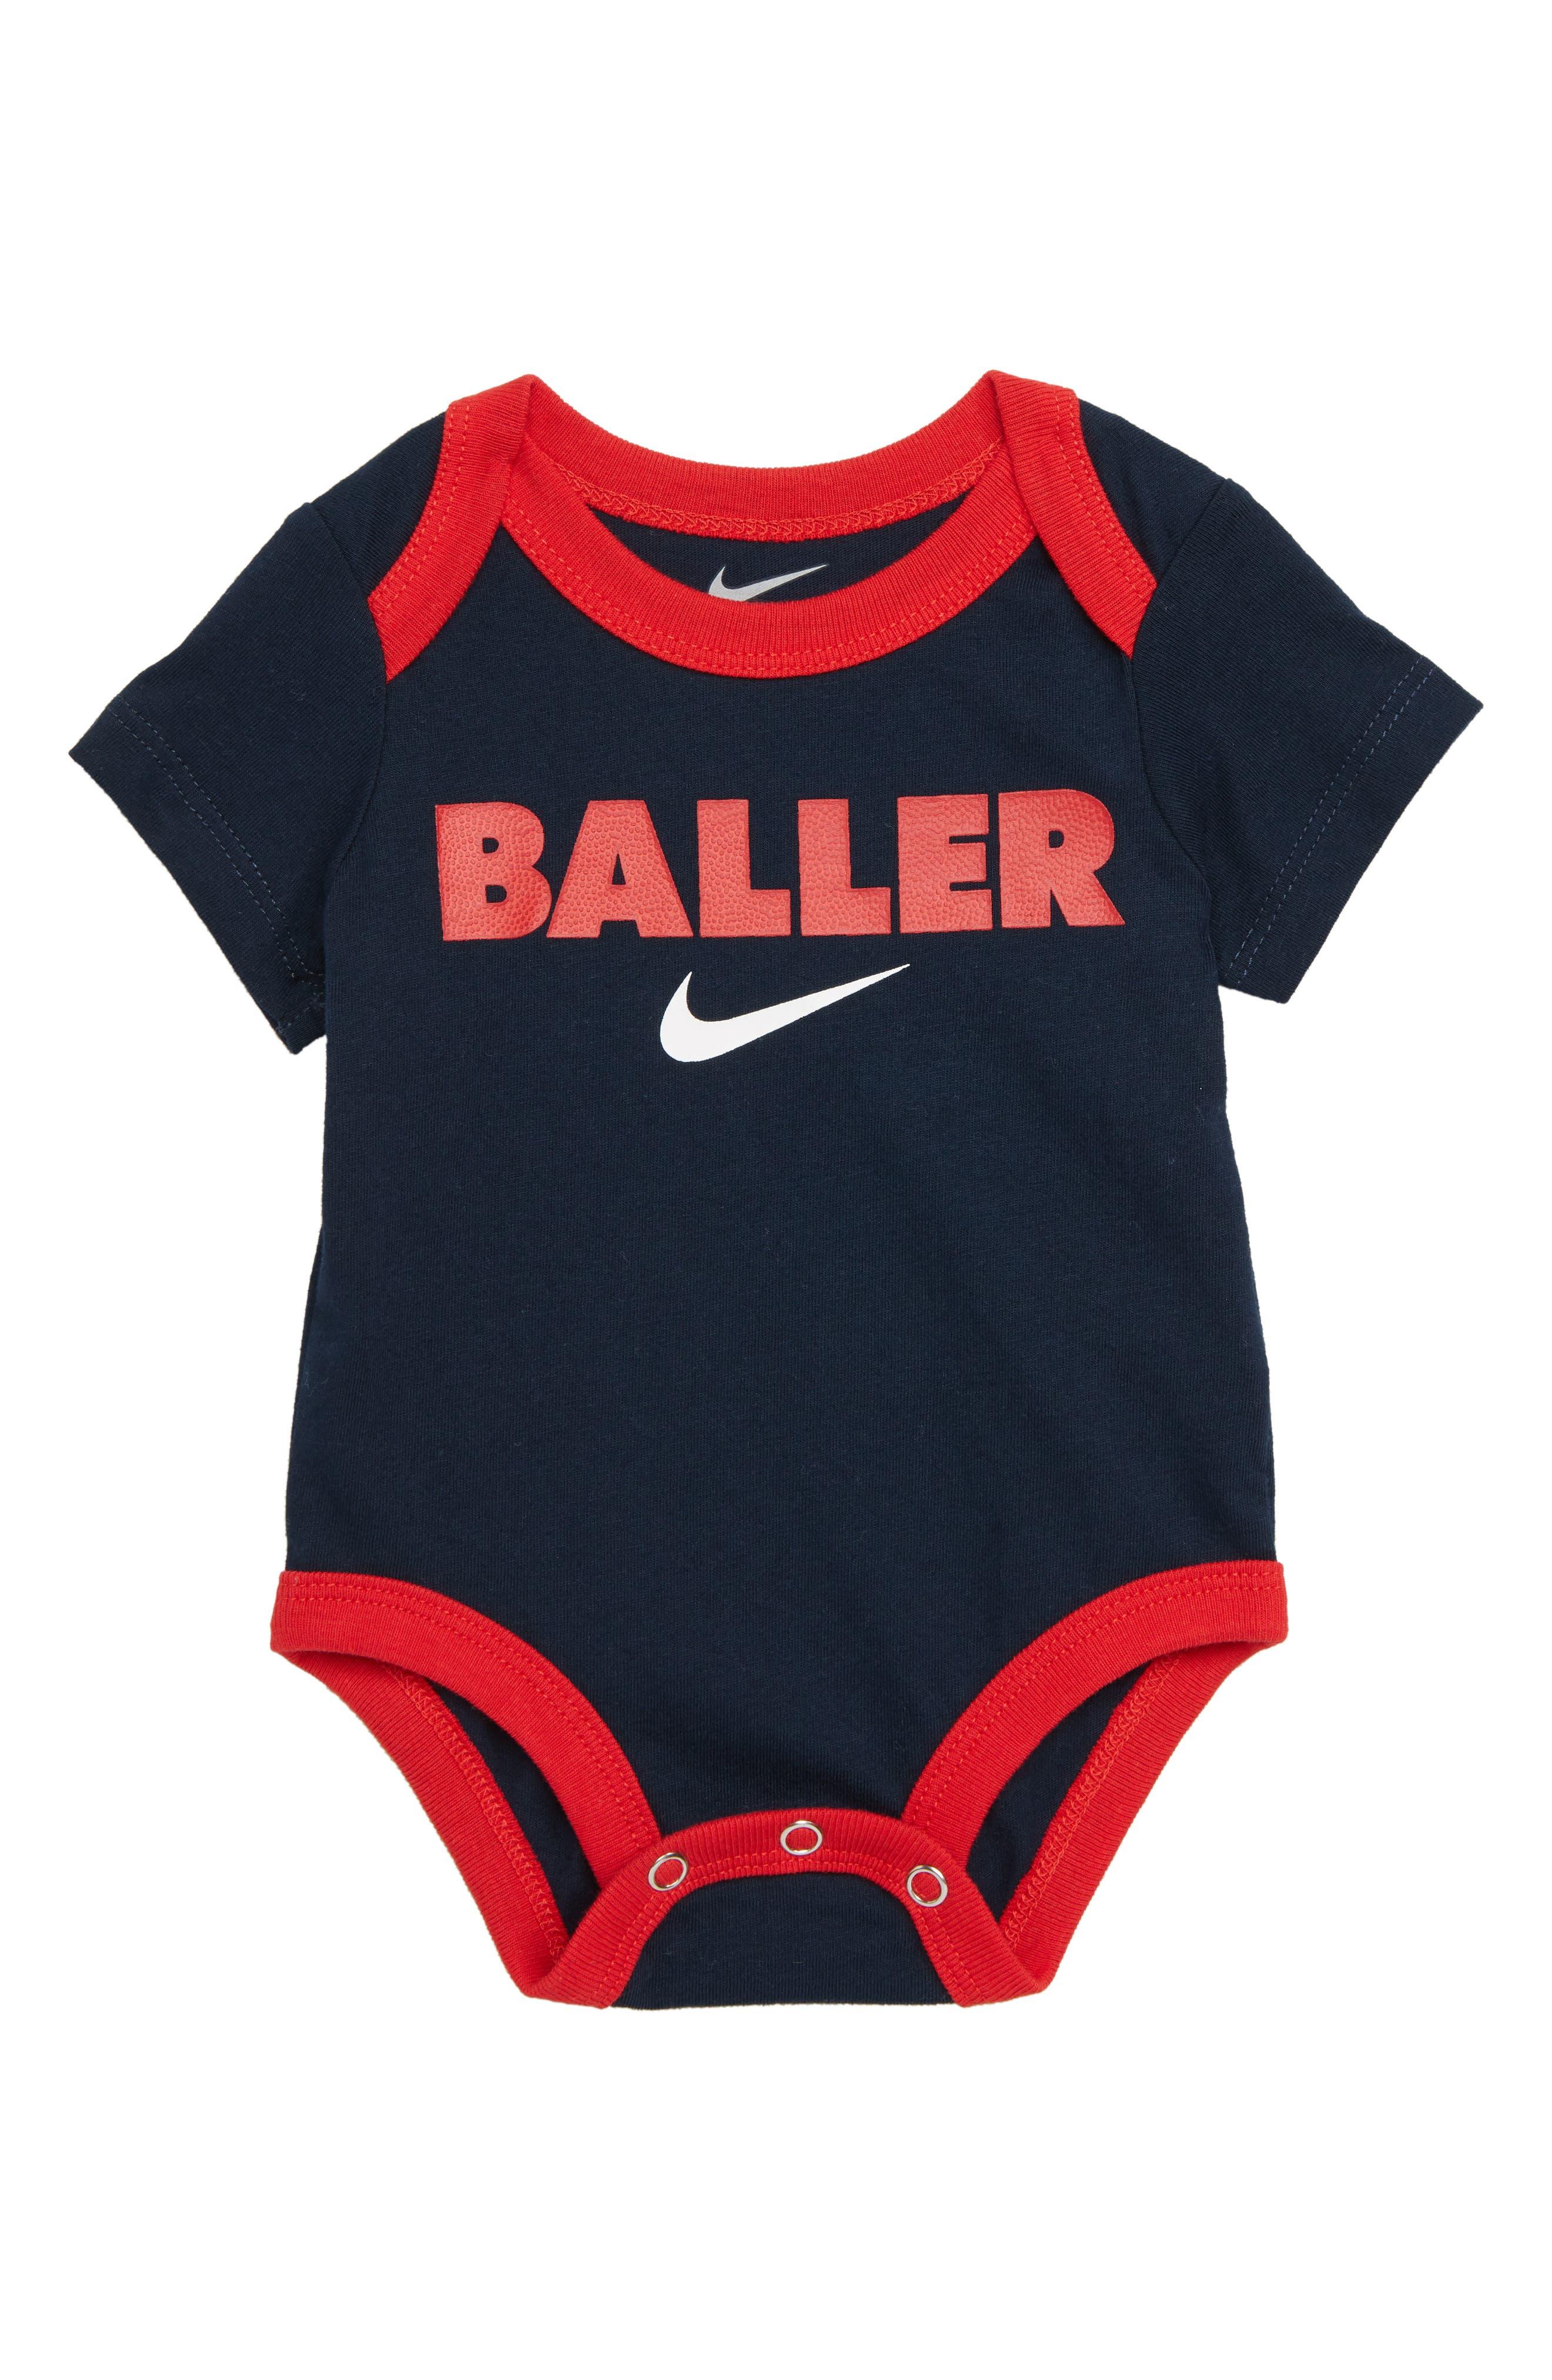 Baller Bodysuit,                         Main,                         color, 425